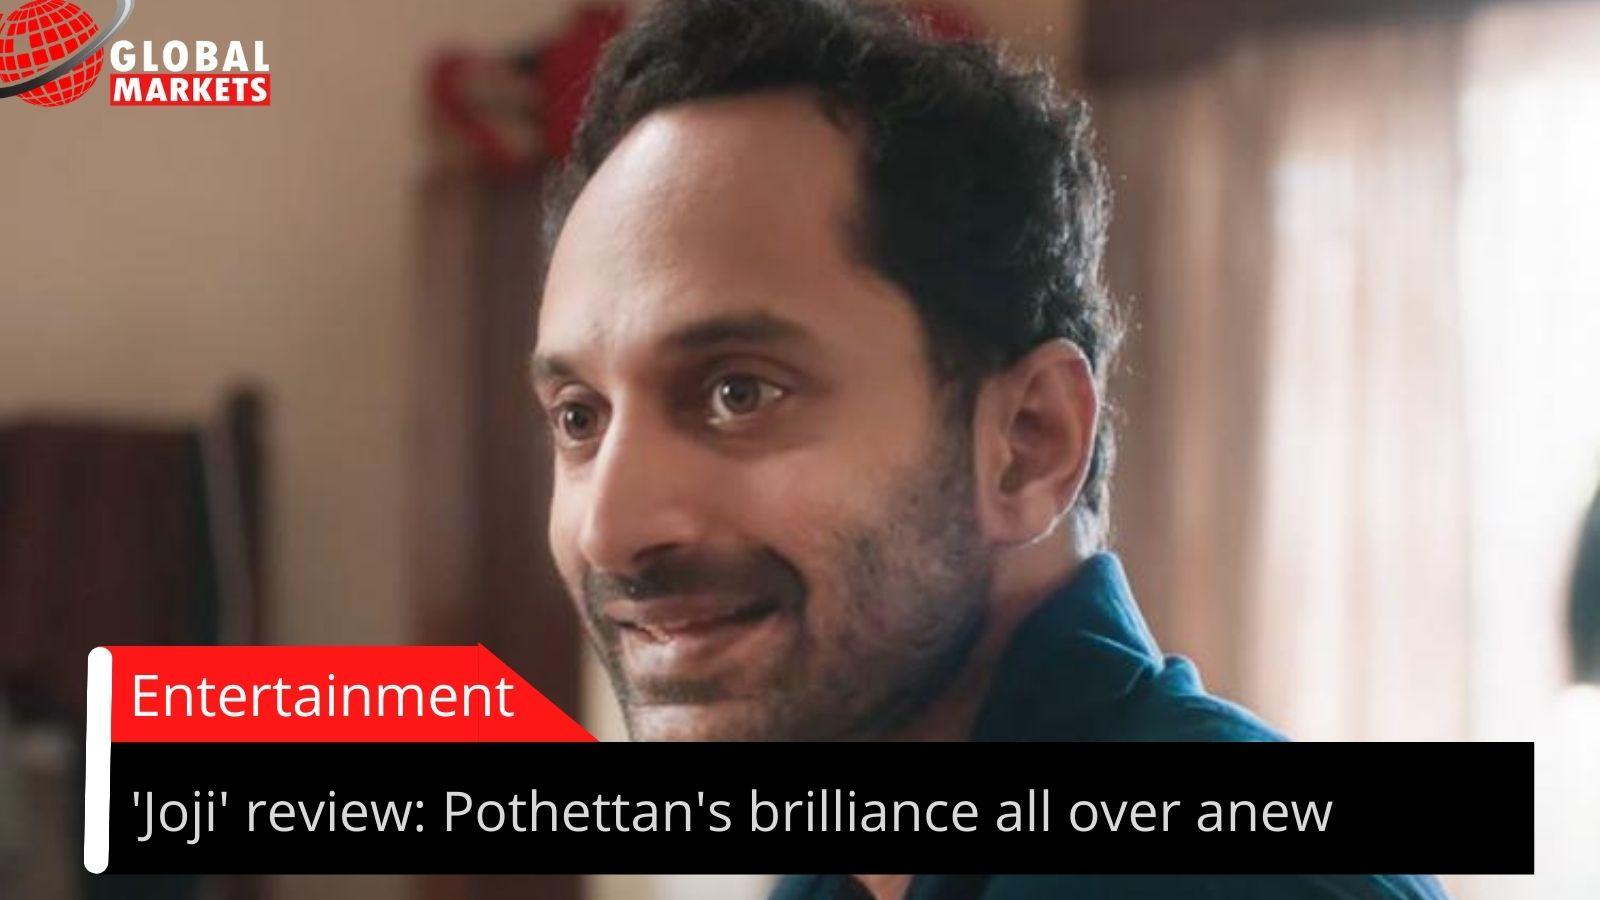 JOJI review: Pothettan's brilliance all over anew